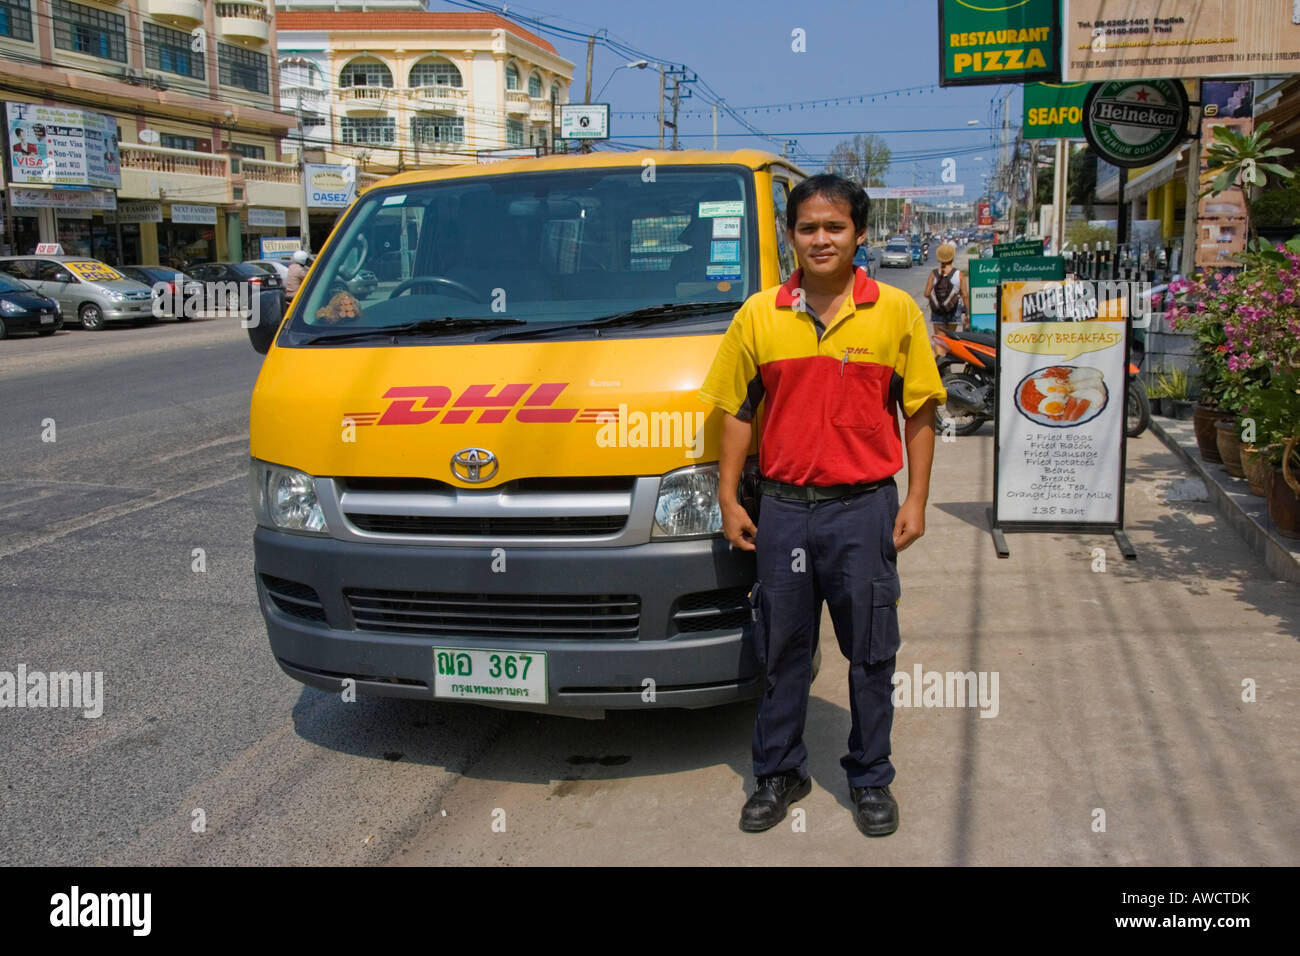 Courier Driver Jobs Employment